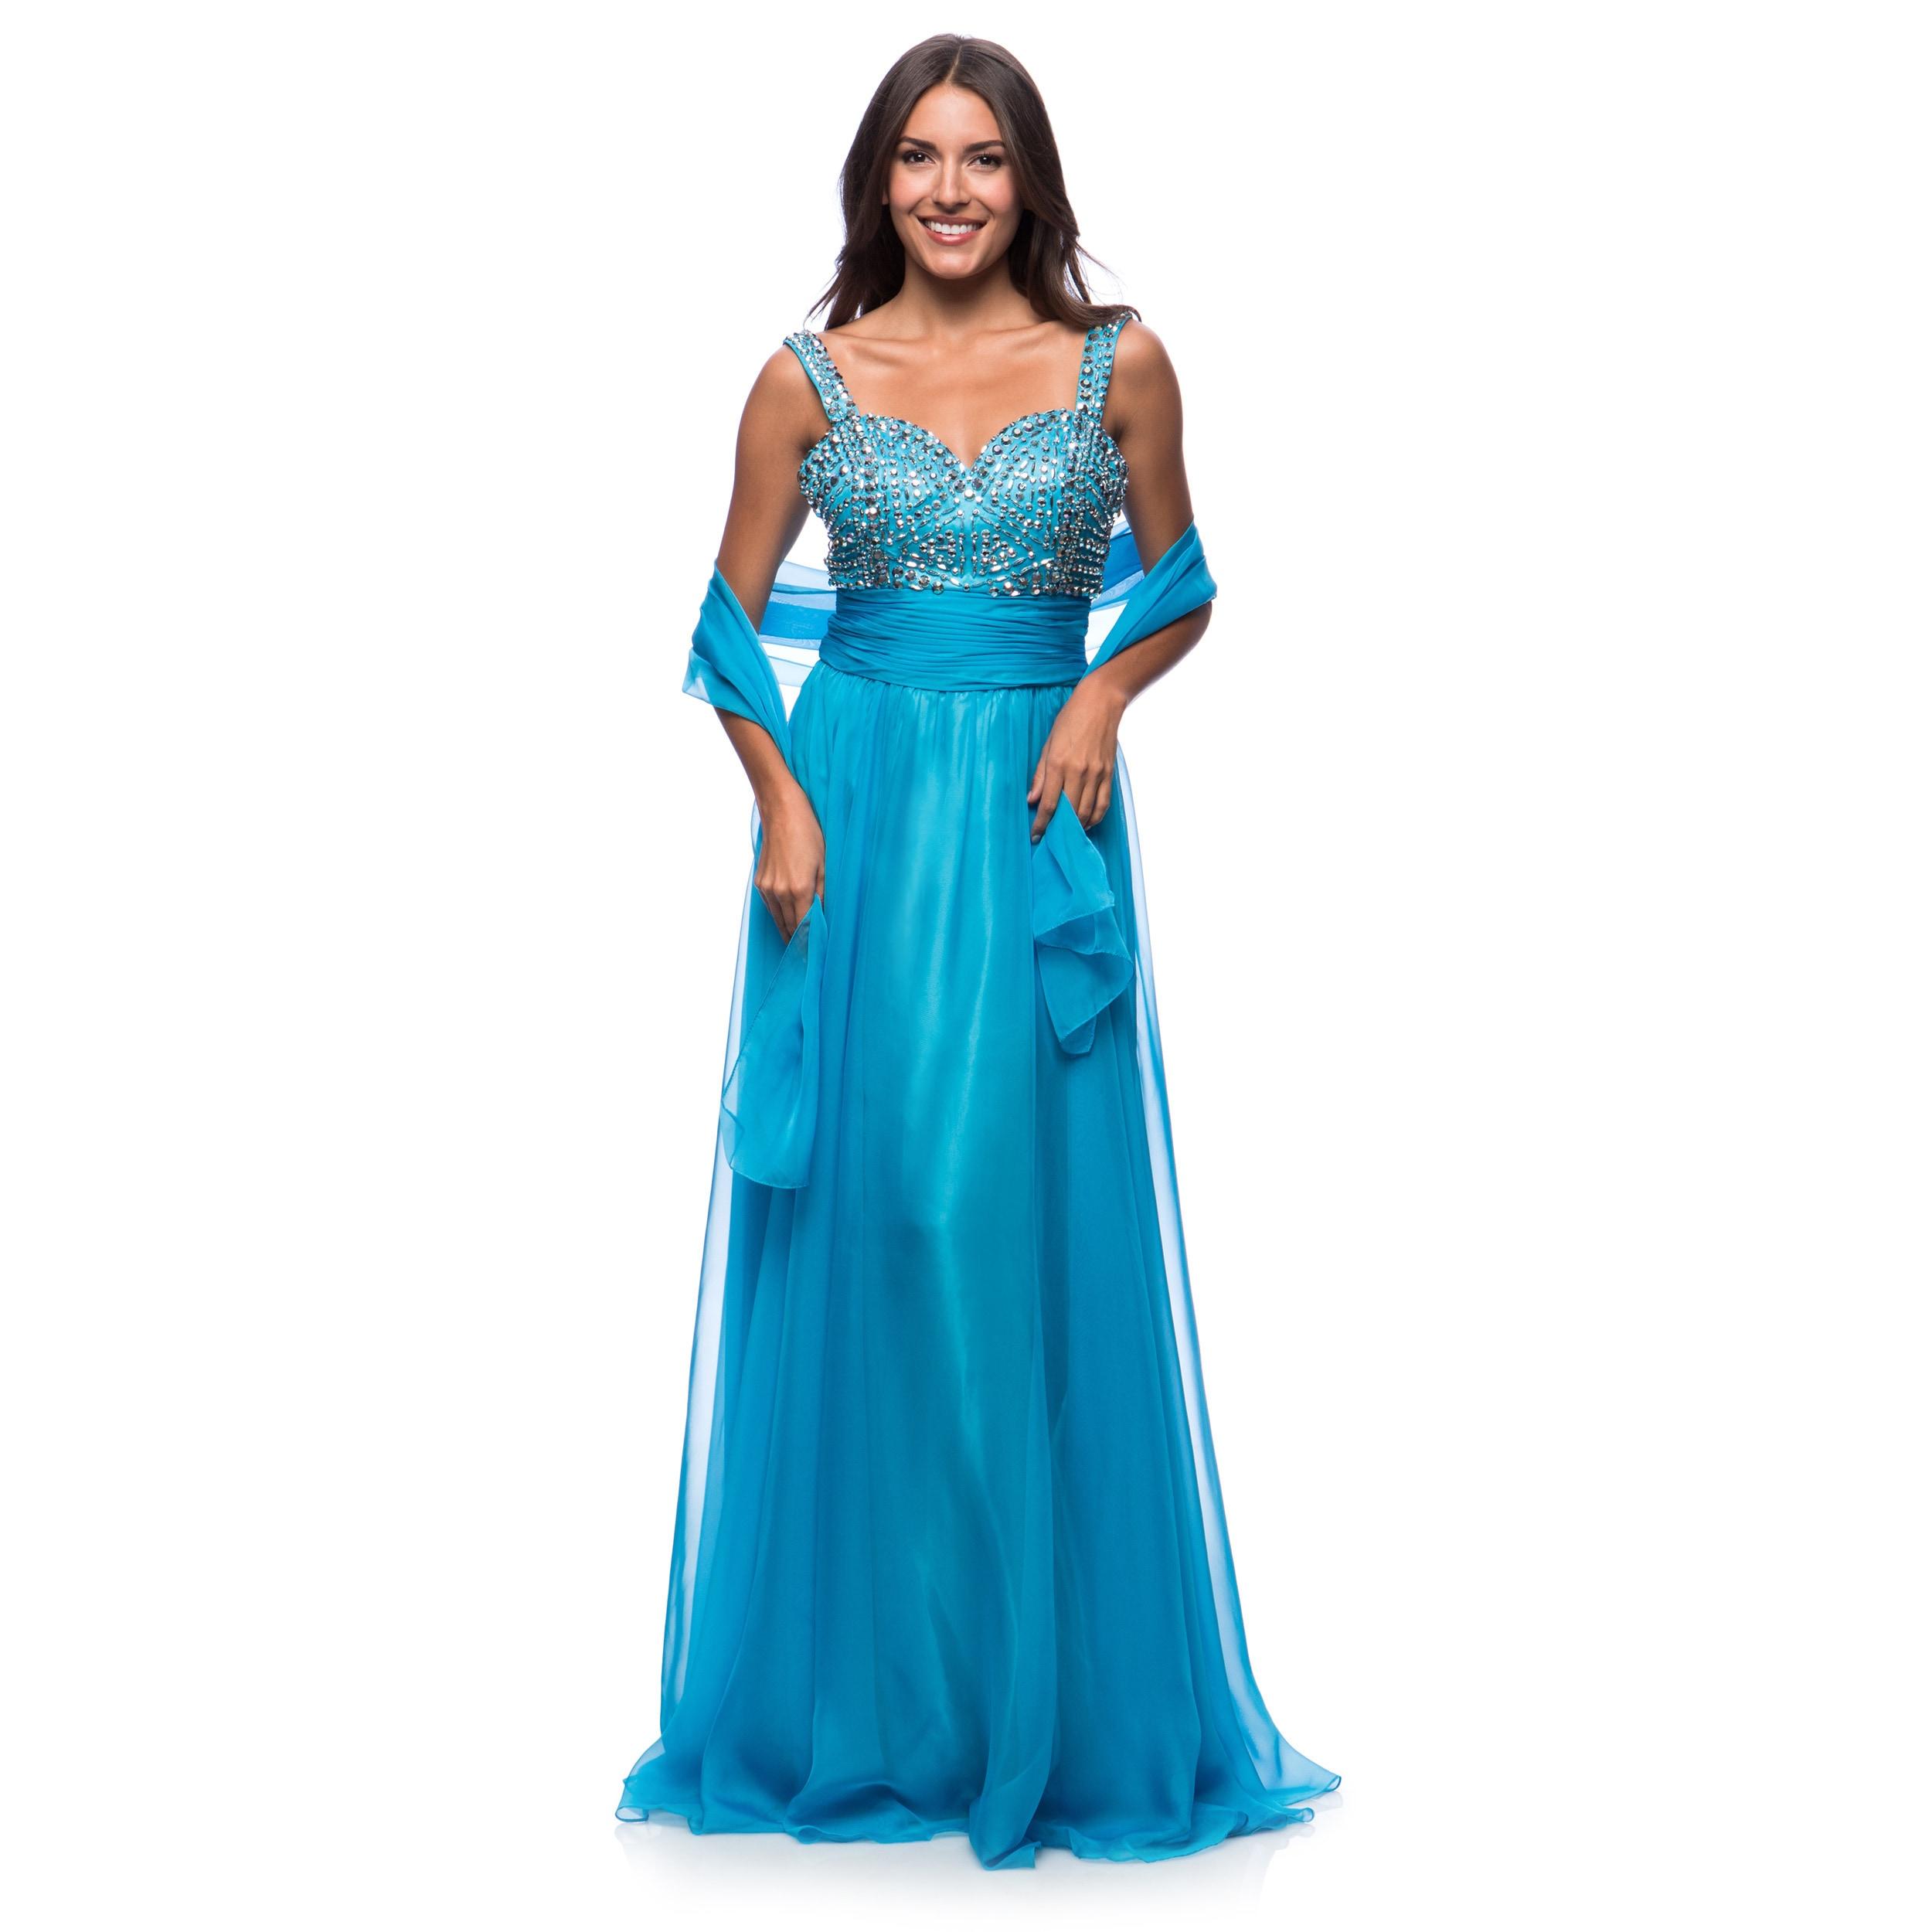 Blue Evening & Formal Dresses For Less | Overstock.com